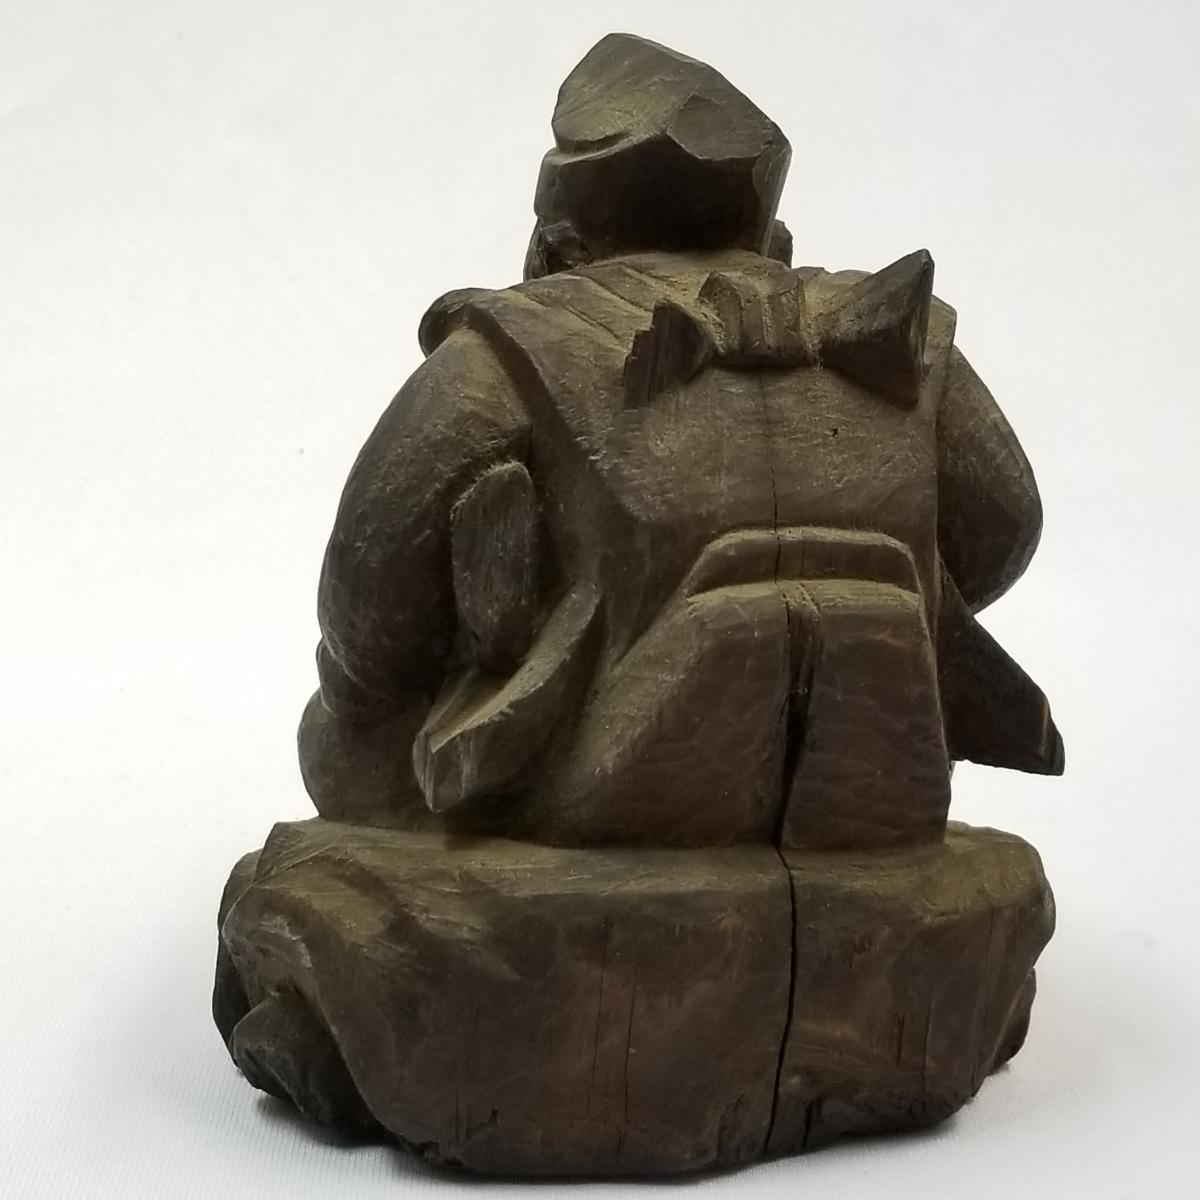 ◇時代物 木製 木彫り 彫刻 置物 恵比寿大黒 検索/ 仏具 仏像 寺院 宗教 東洋 中国美術 アンティーク (t5-3/1_画像10